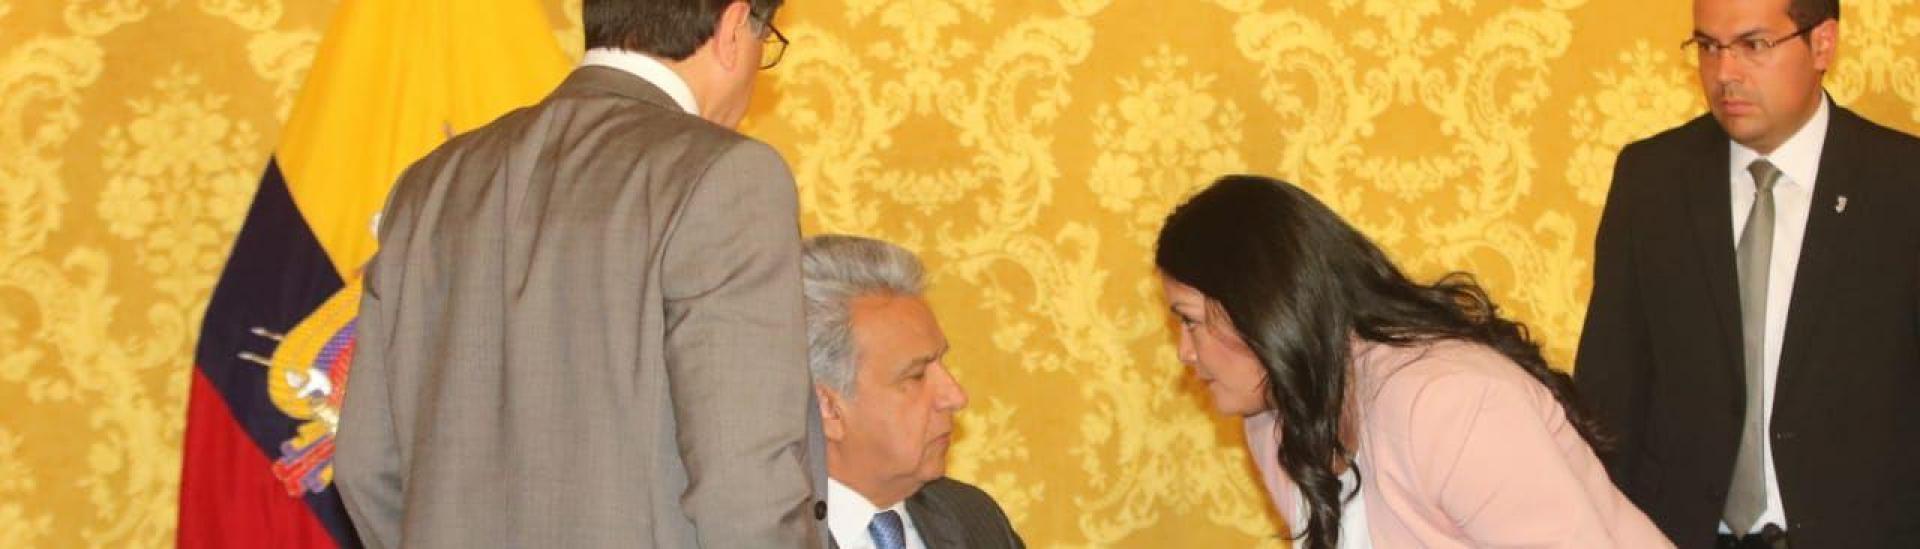 Moreno Salud